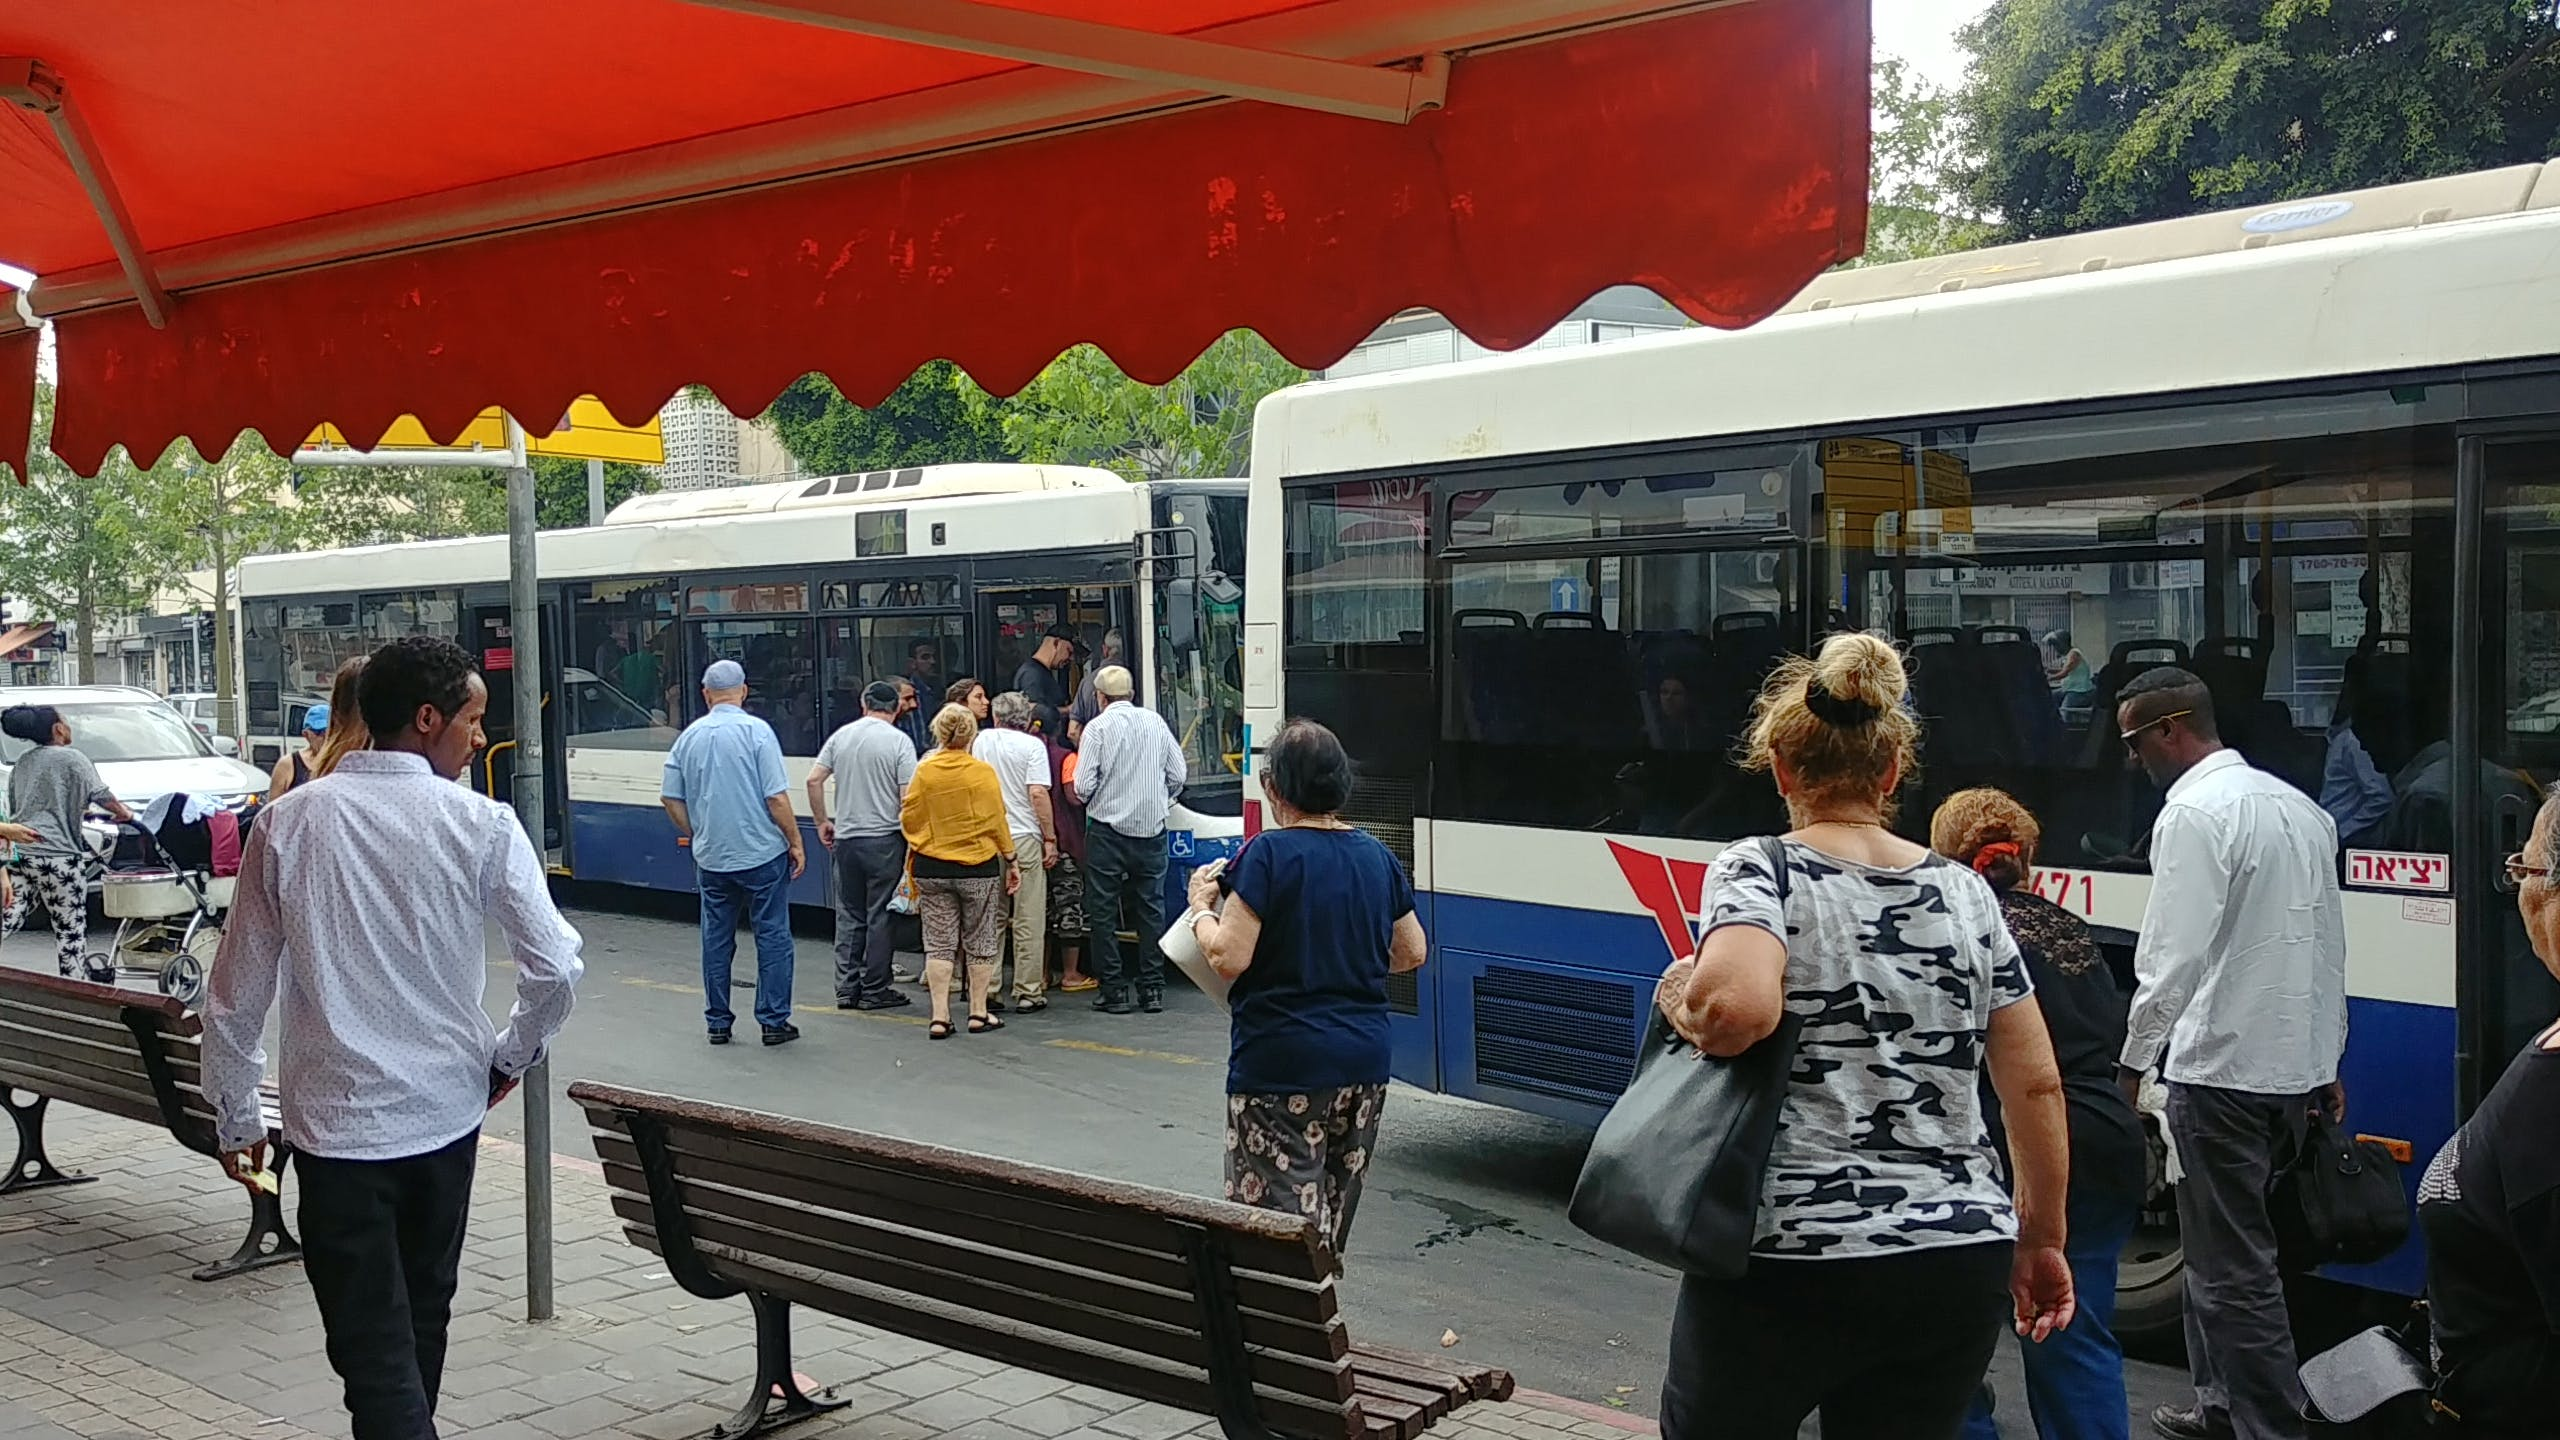 Free stock photo of public transportation, הוֹבָלָה